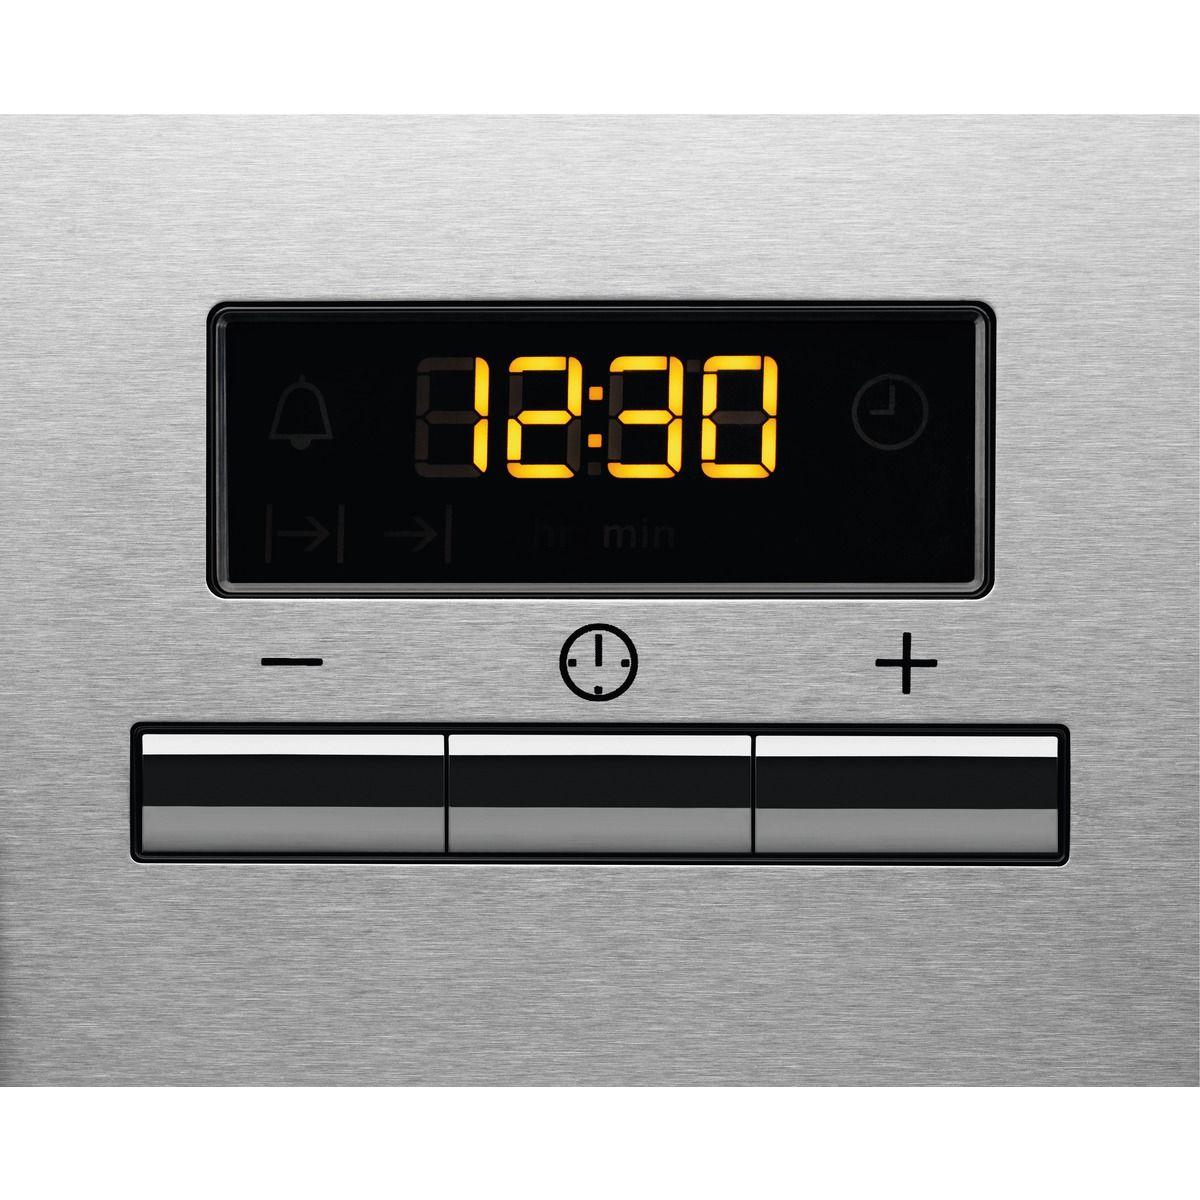 Aragaz Electrolux Eki54950ox Pret Avantajos Ideall Ro